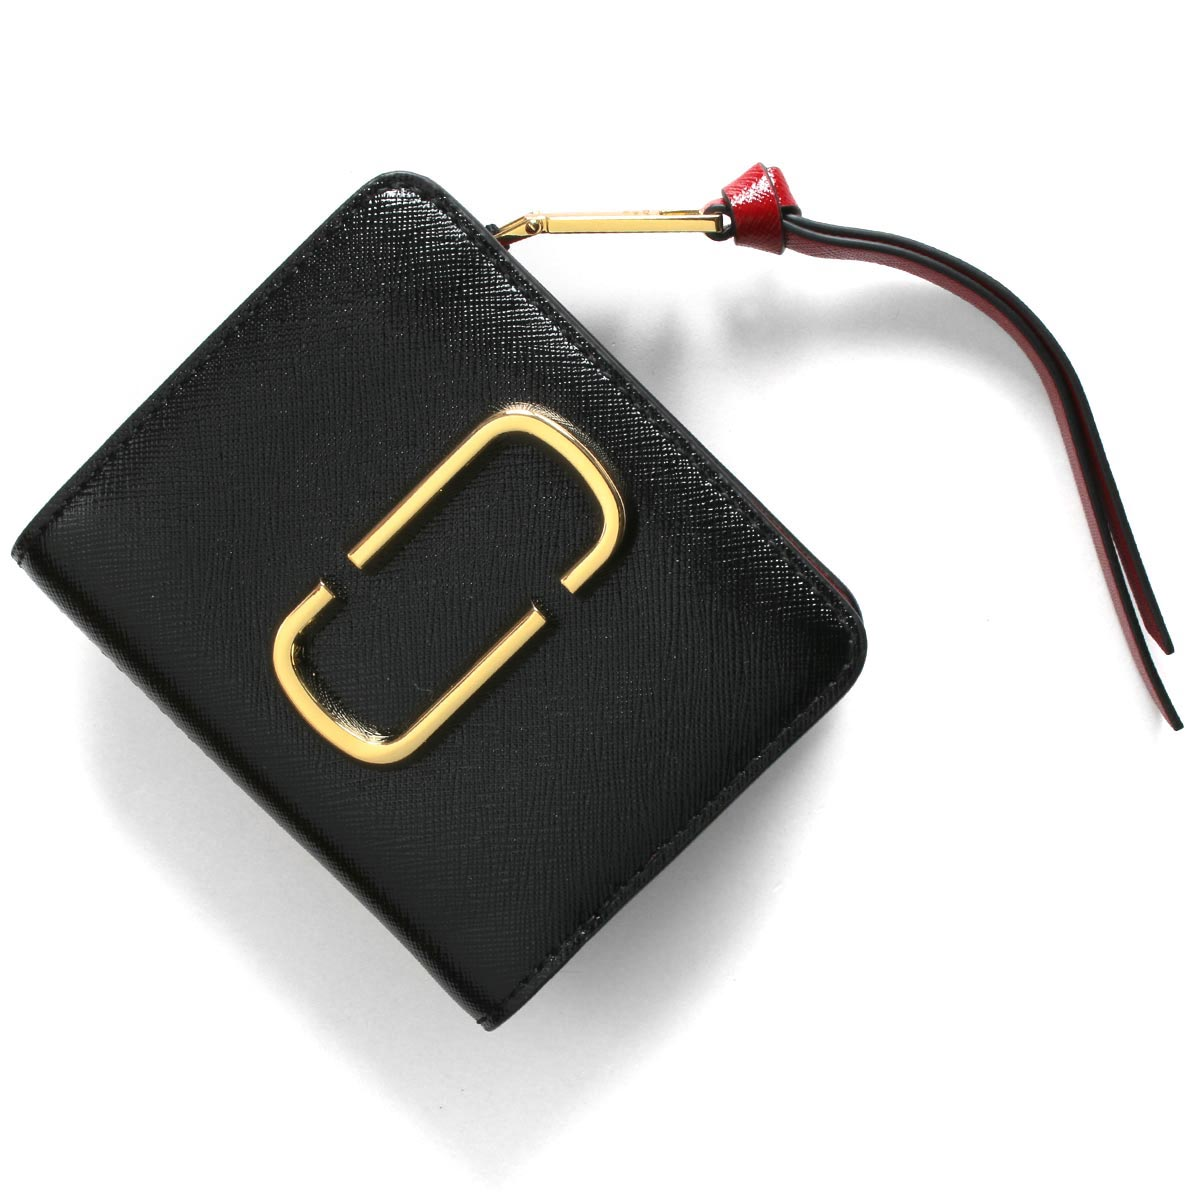 『Snapshot Mini Compact Wallet』